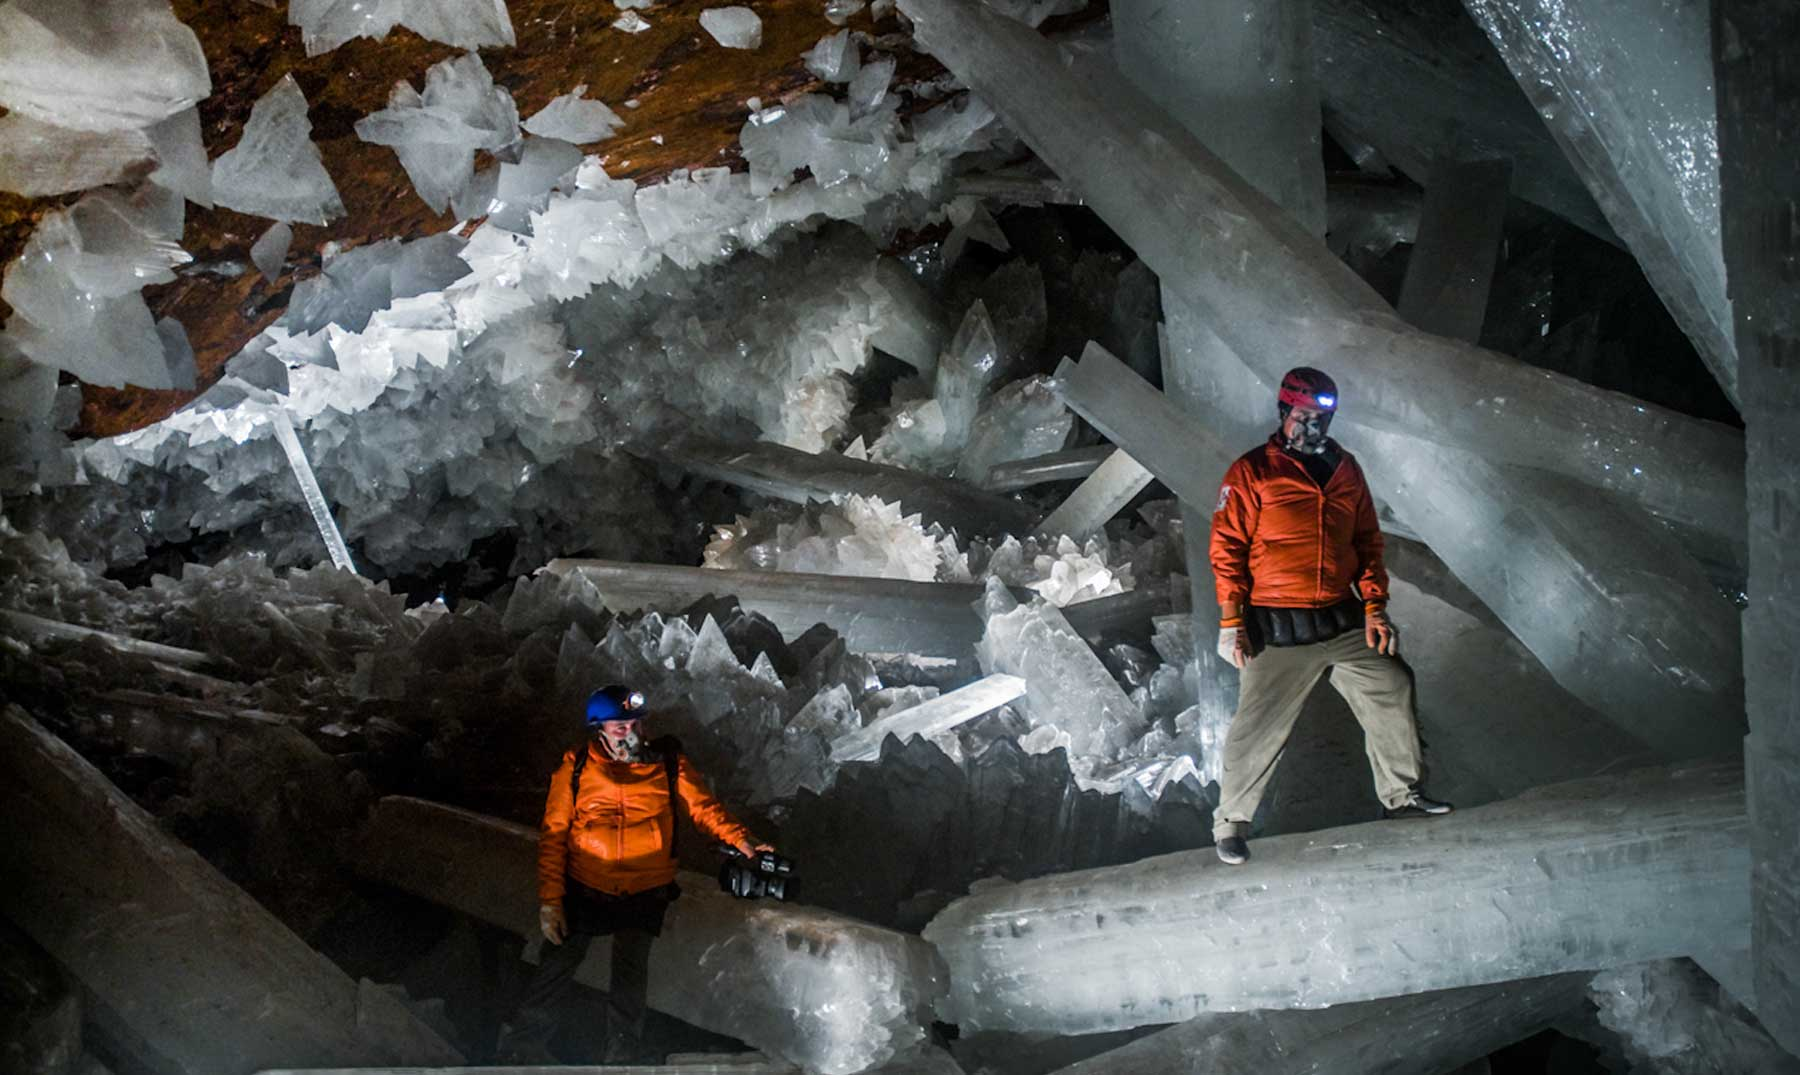 La cueva de cristales gigantes de México